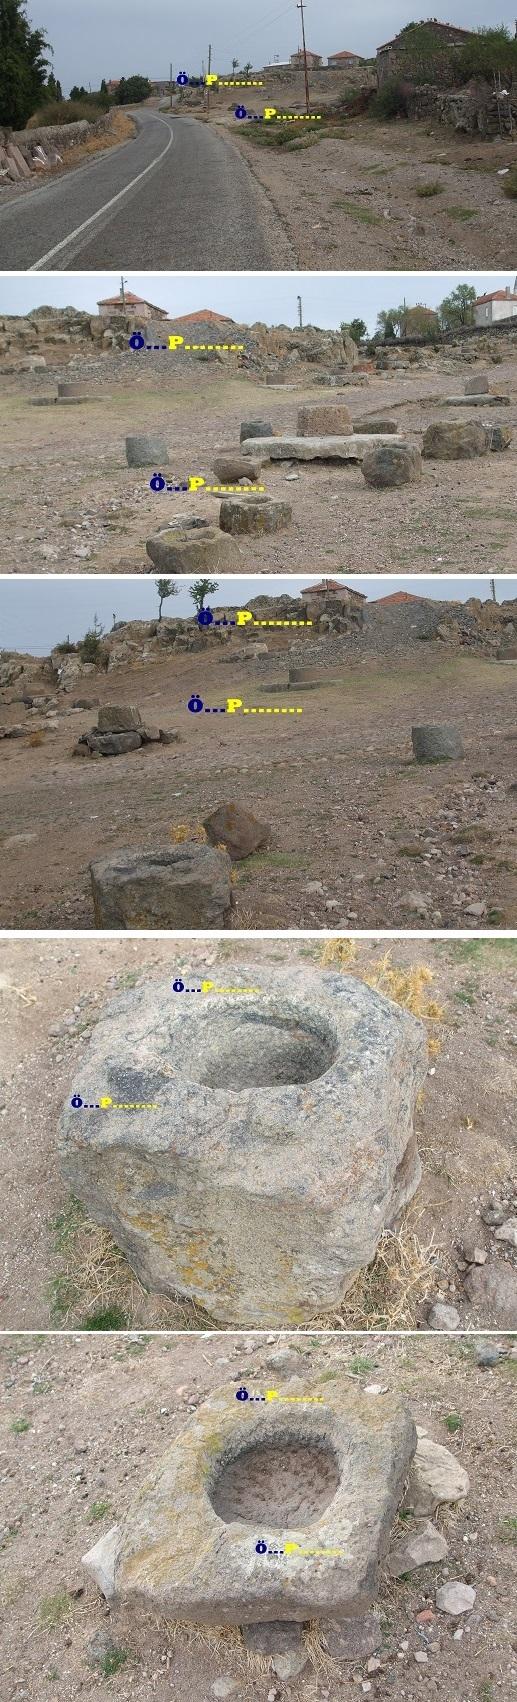 Kuyular hayvan sulama taşları görseldir